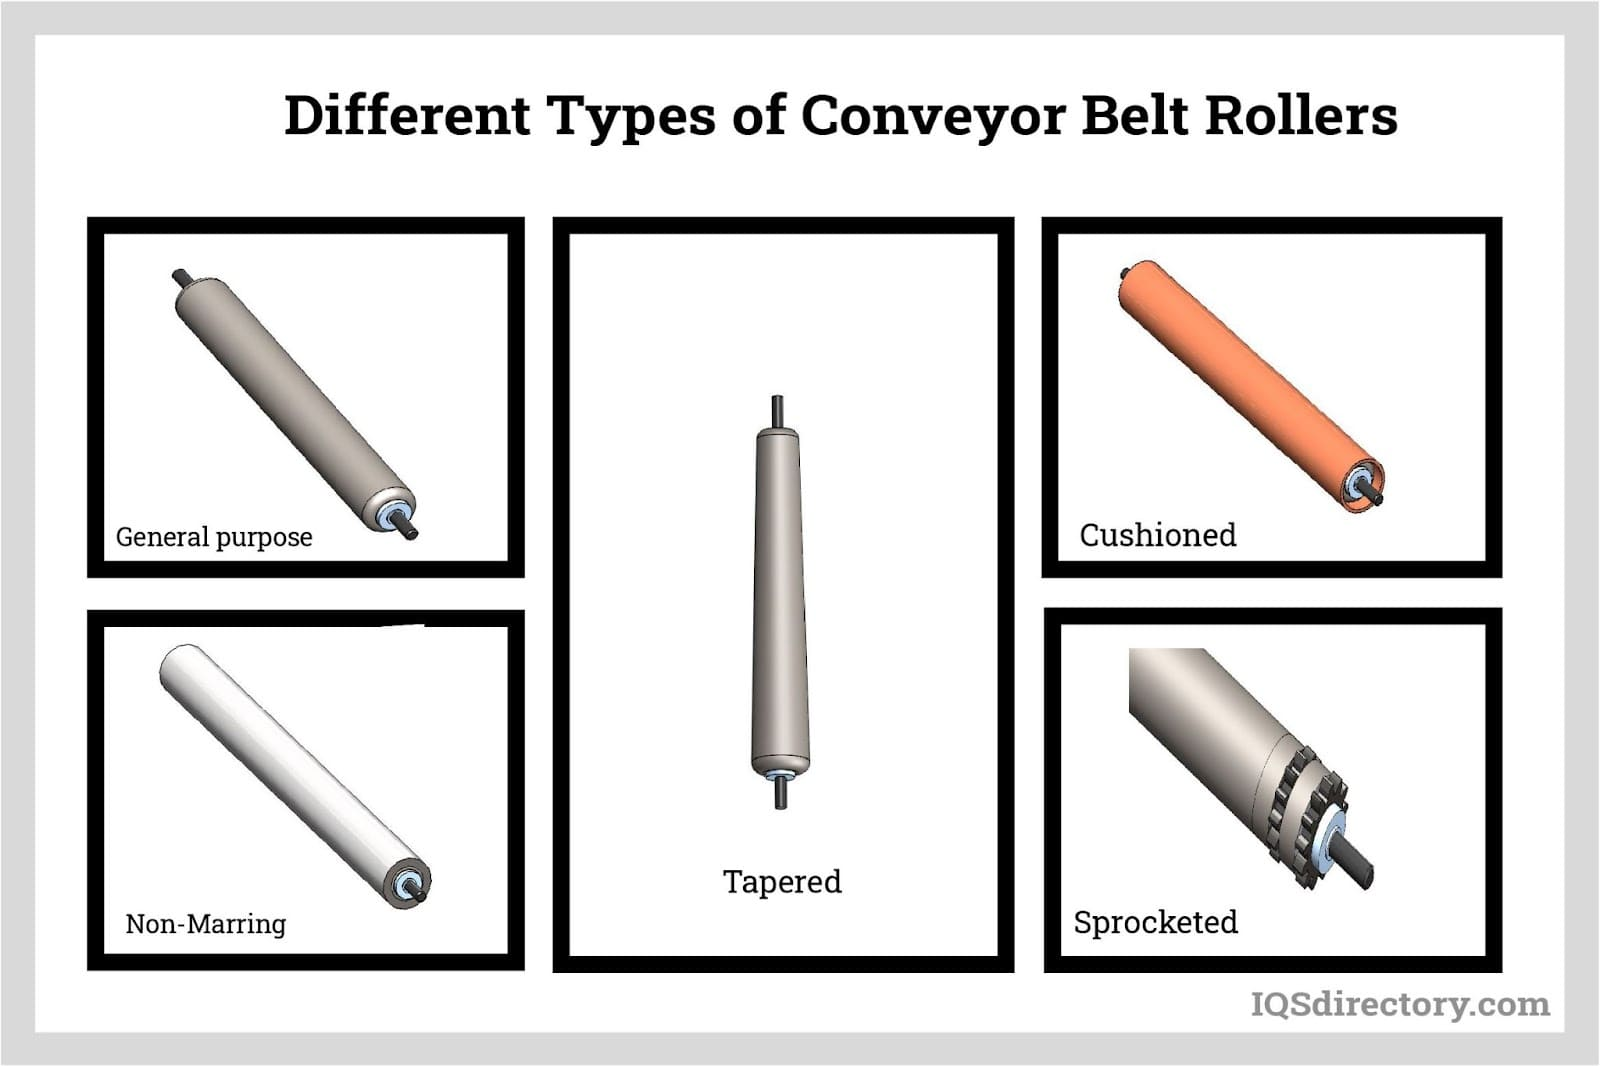 Different Types of Conveyor Belt Rollers